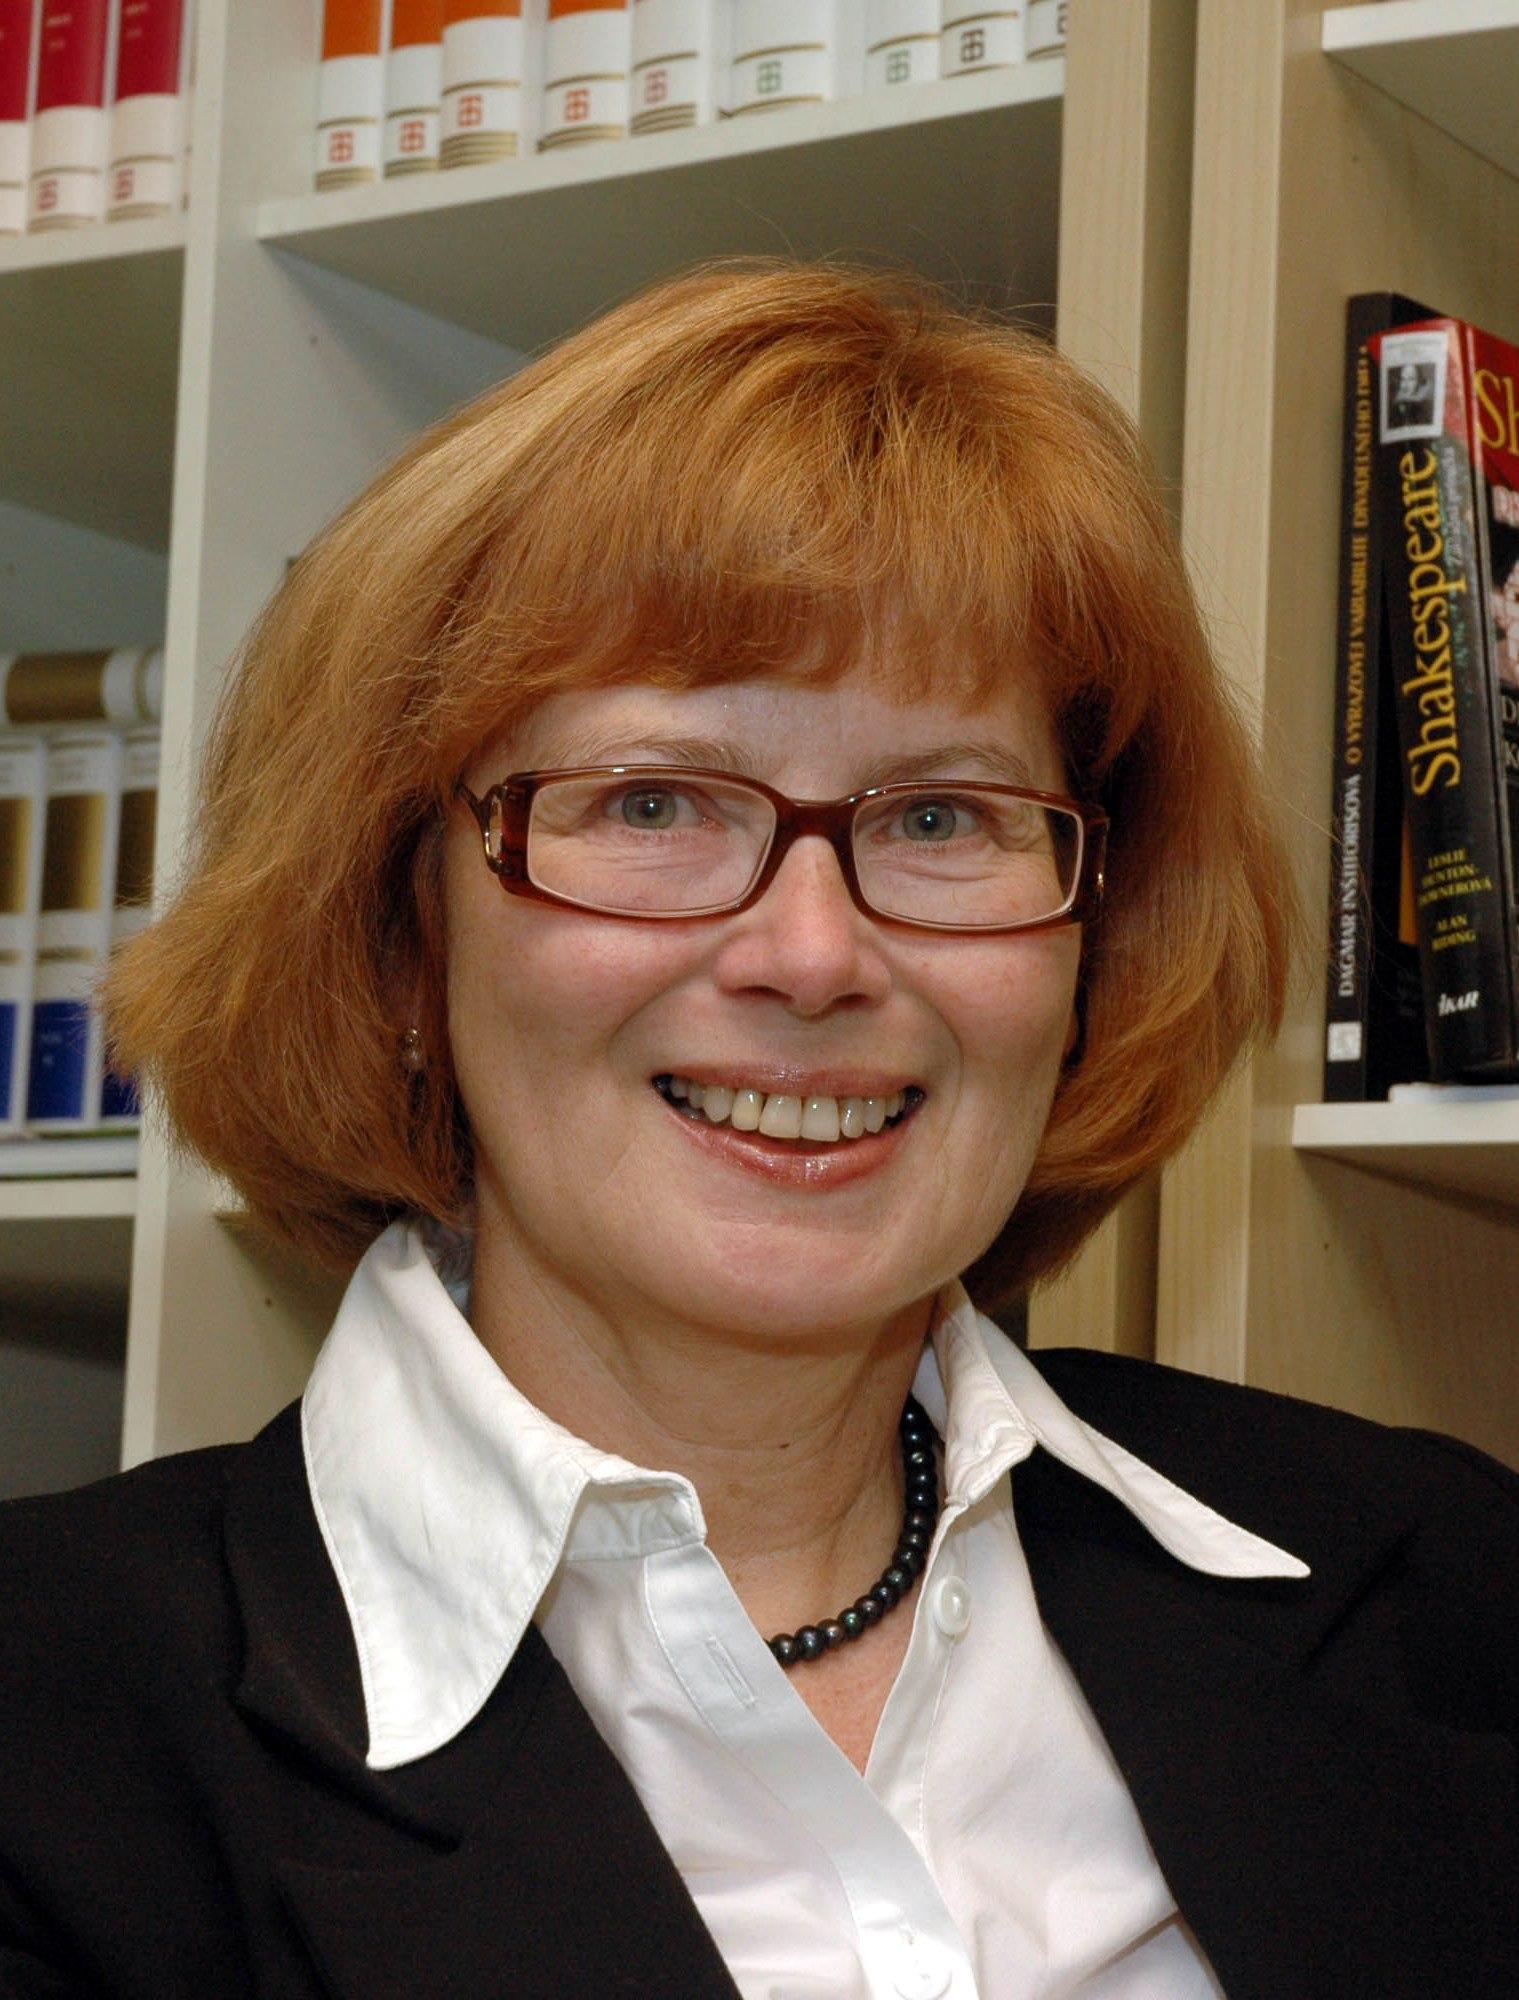 Dagmar Podmakova